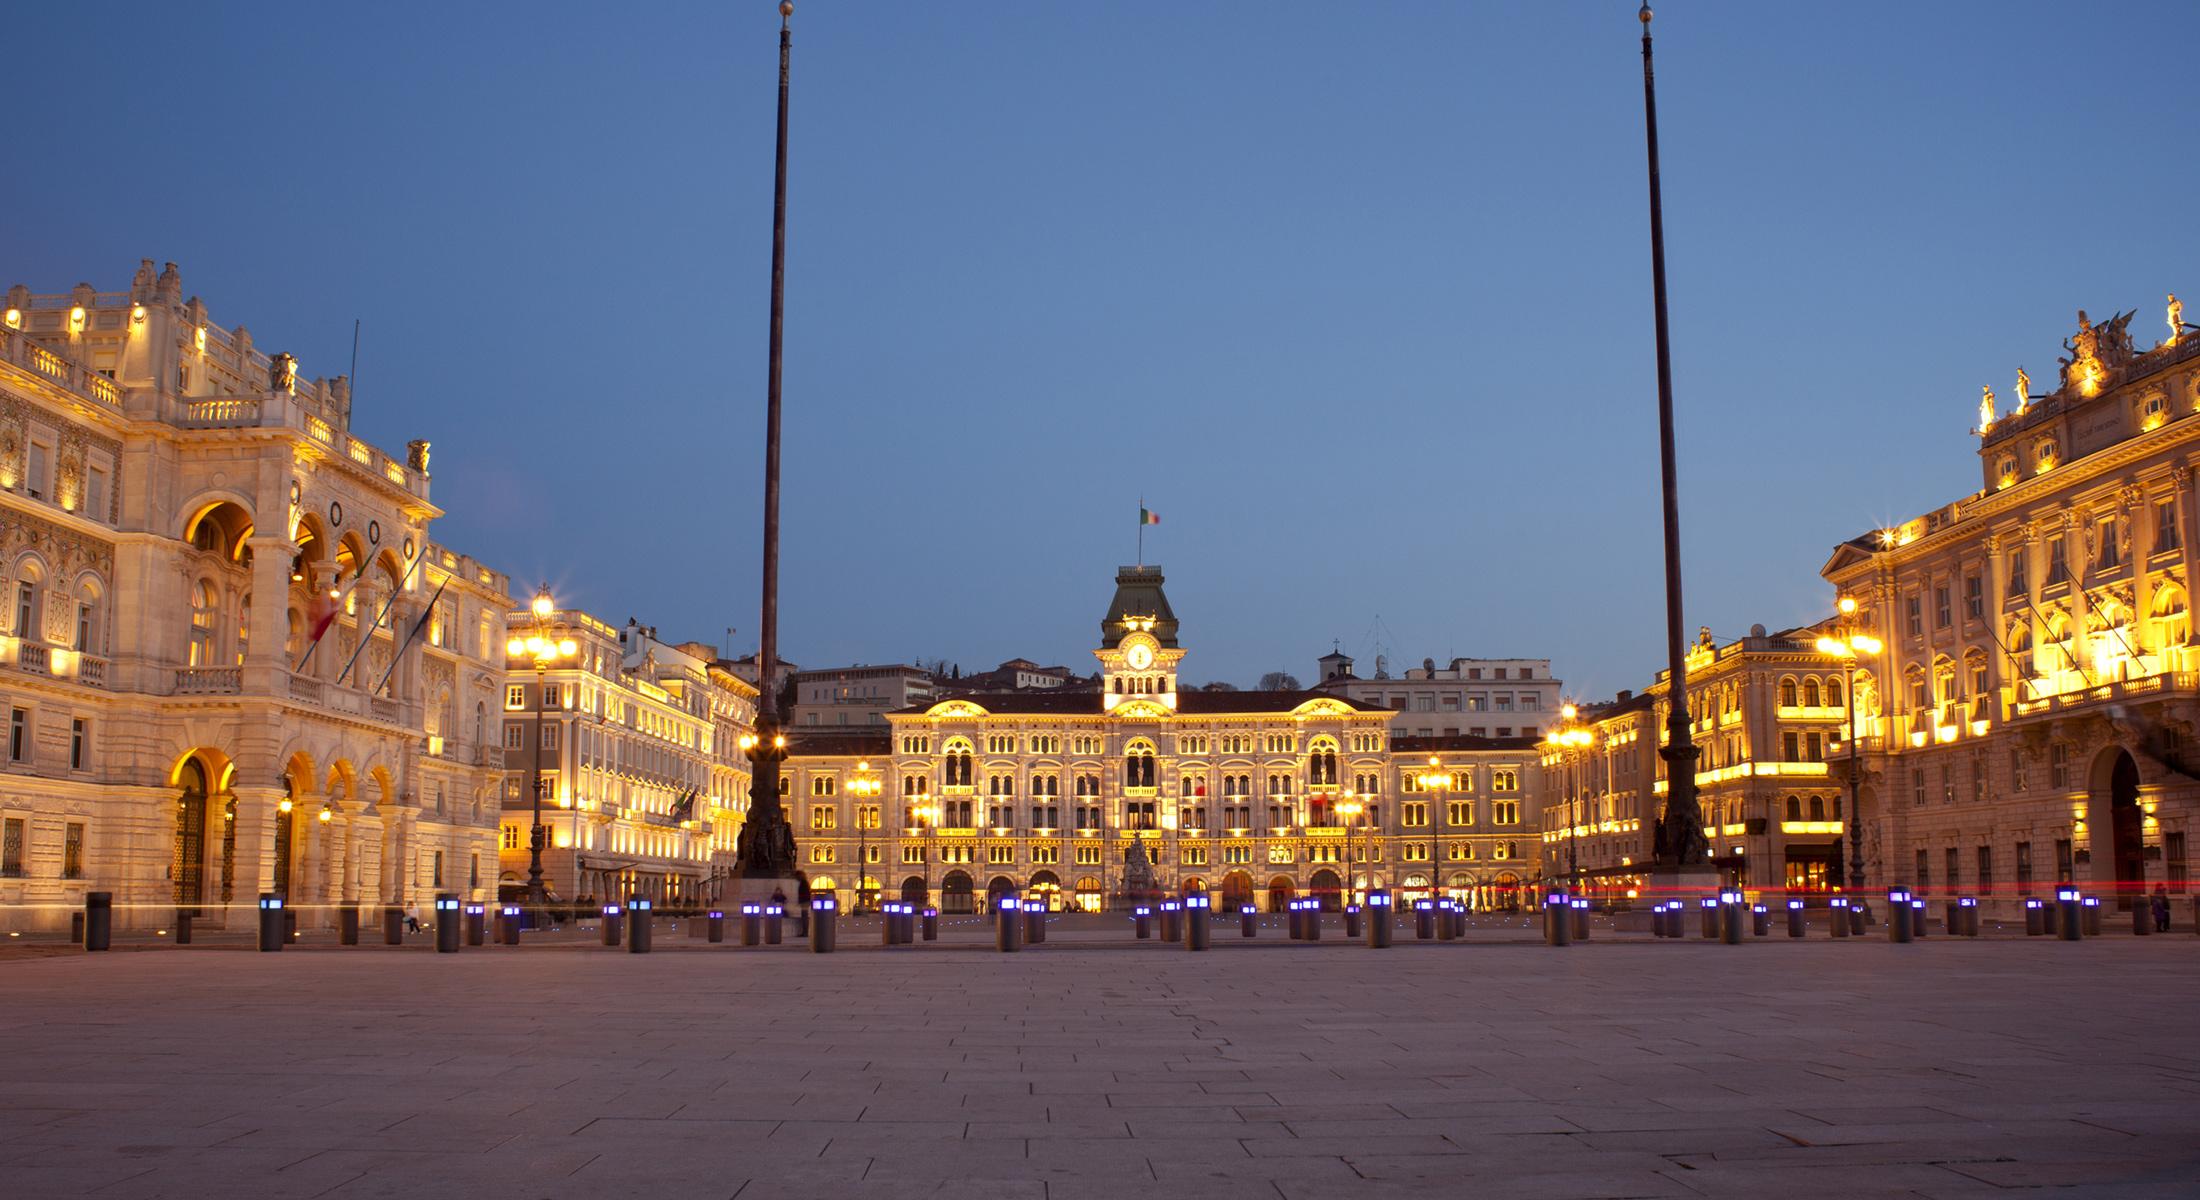 Tripadvisor Hotel Trieste